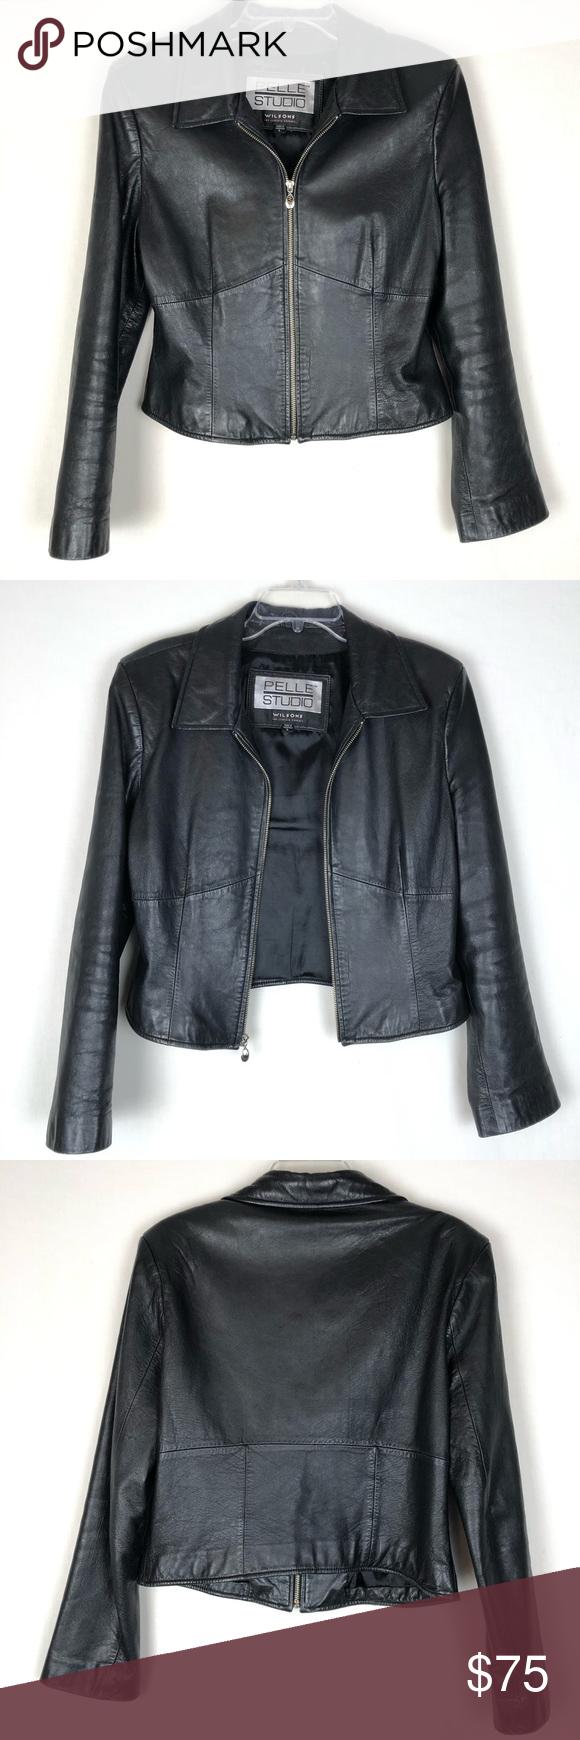 Wilsons Pelle Studio leather jacket in 2020 Leather